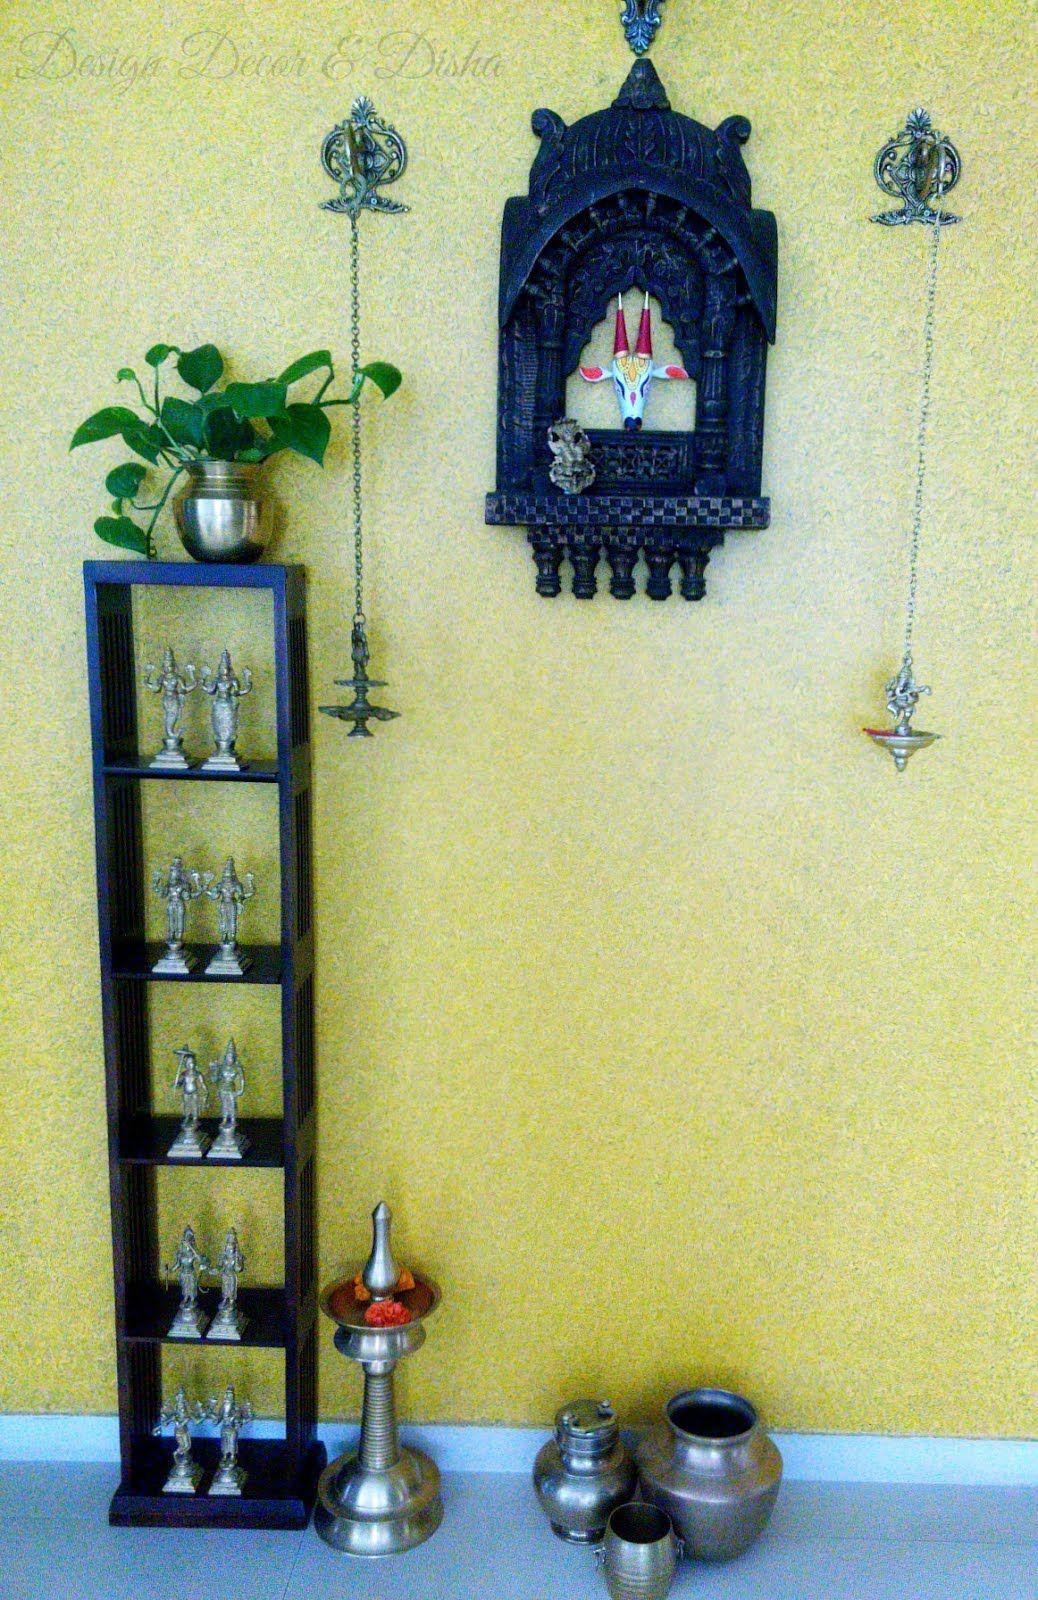 Indian Wall Decor | Decoration | Pinterest | Wall decor, Walls and ...